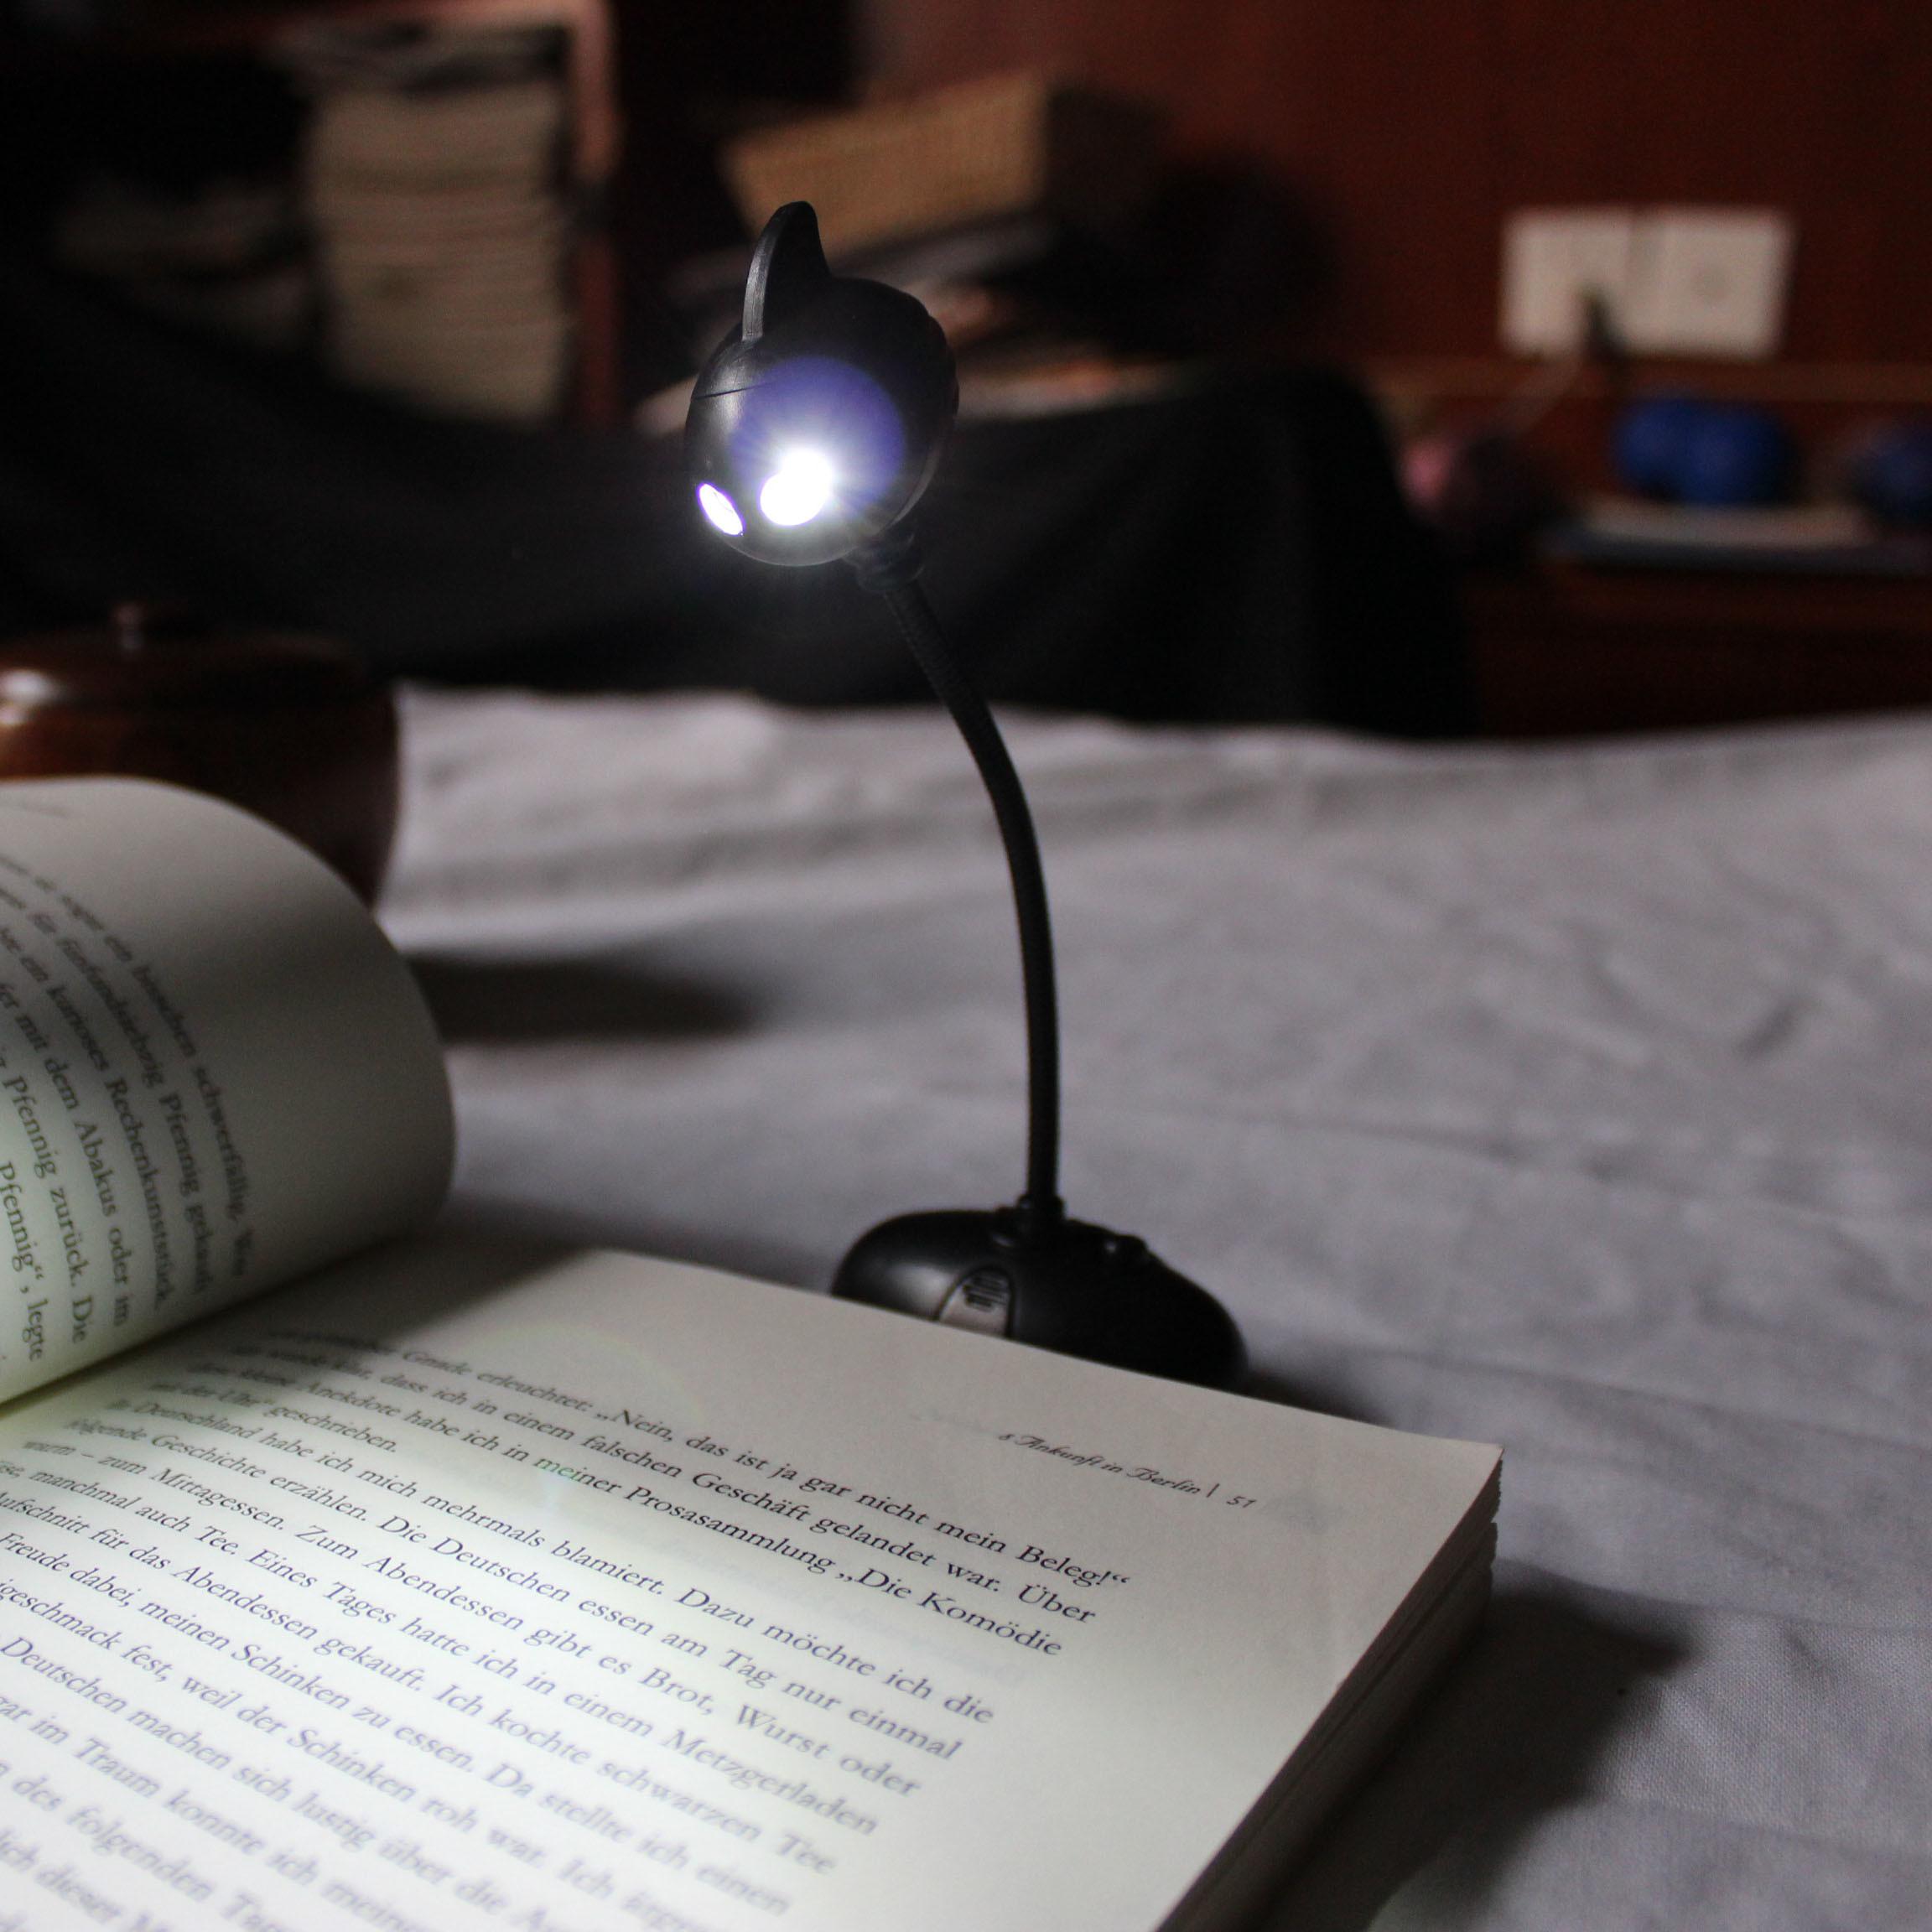 Flexible USB Night LED Lamp for Laptop Reading